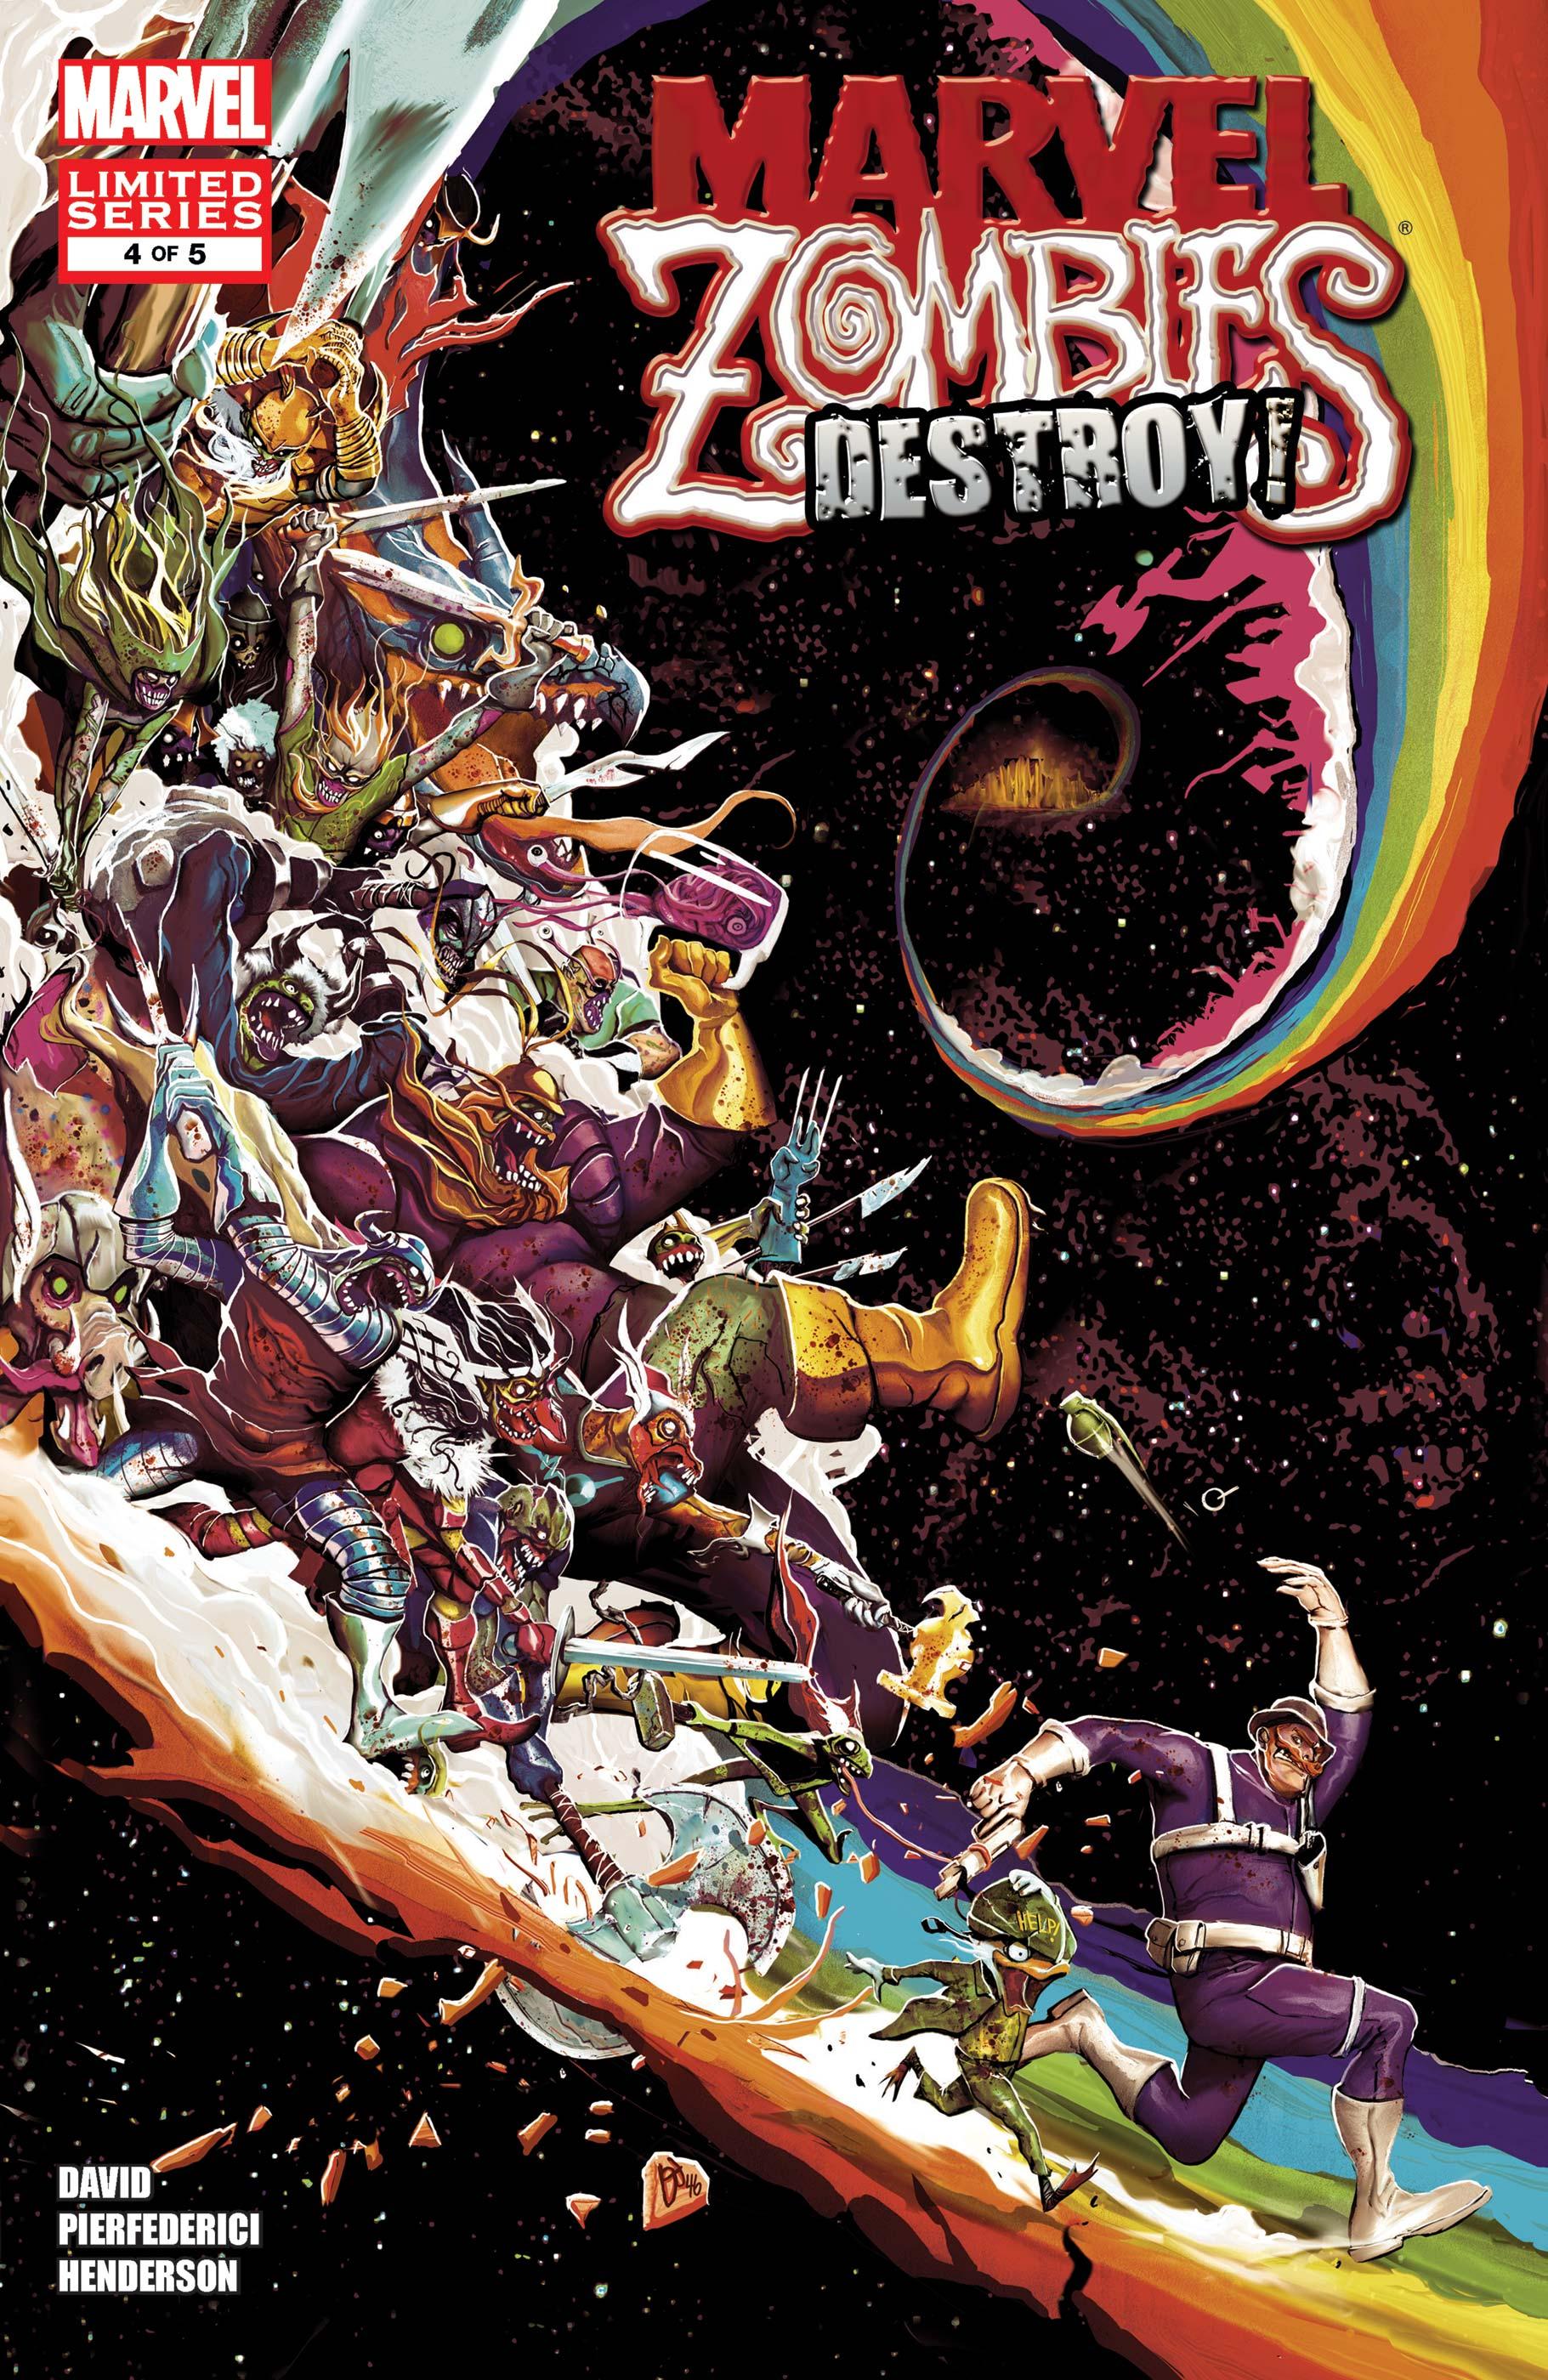 Marvel Zombies Destroy! (2011) #4